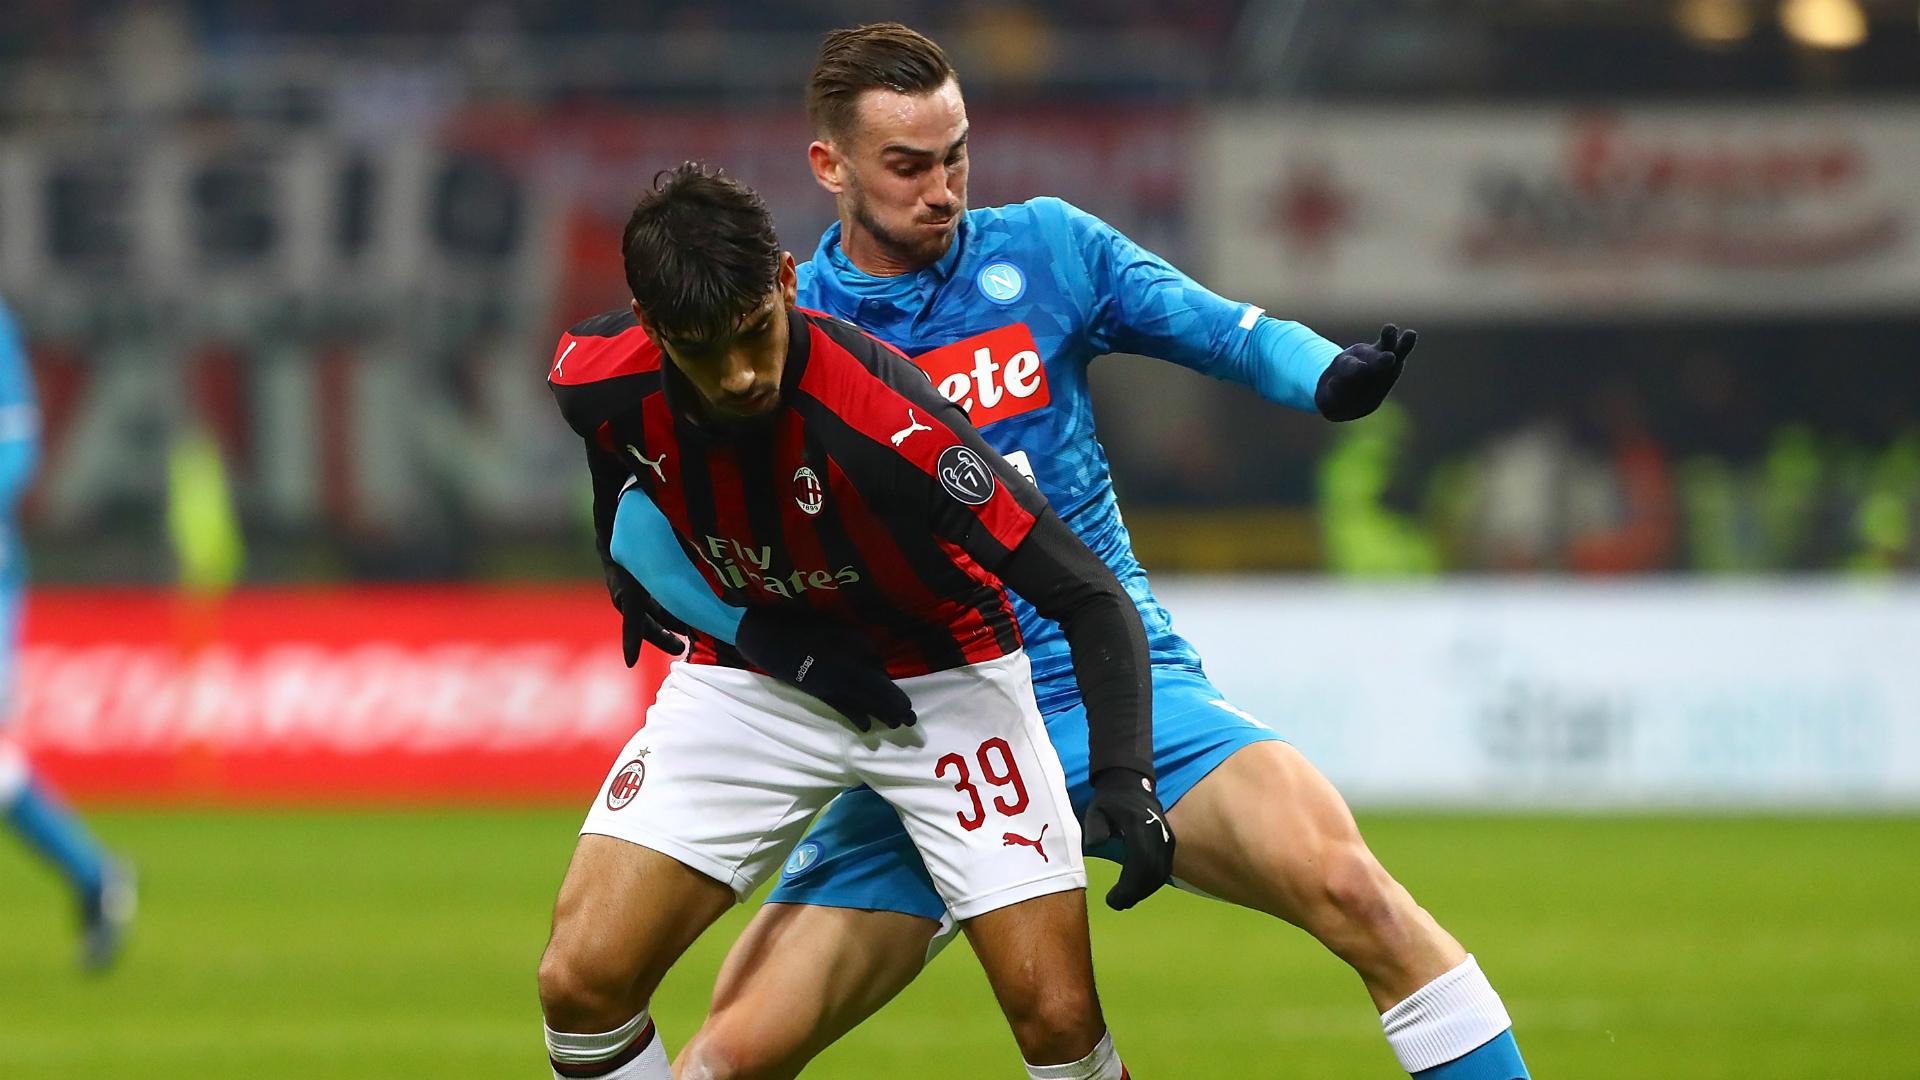 Krzysztof Piatek Scores Twice vs. Napoli in 1st AC Milan Start